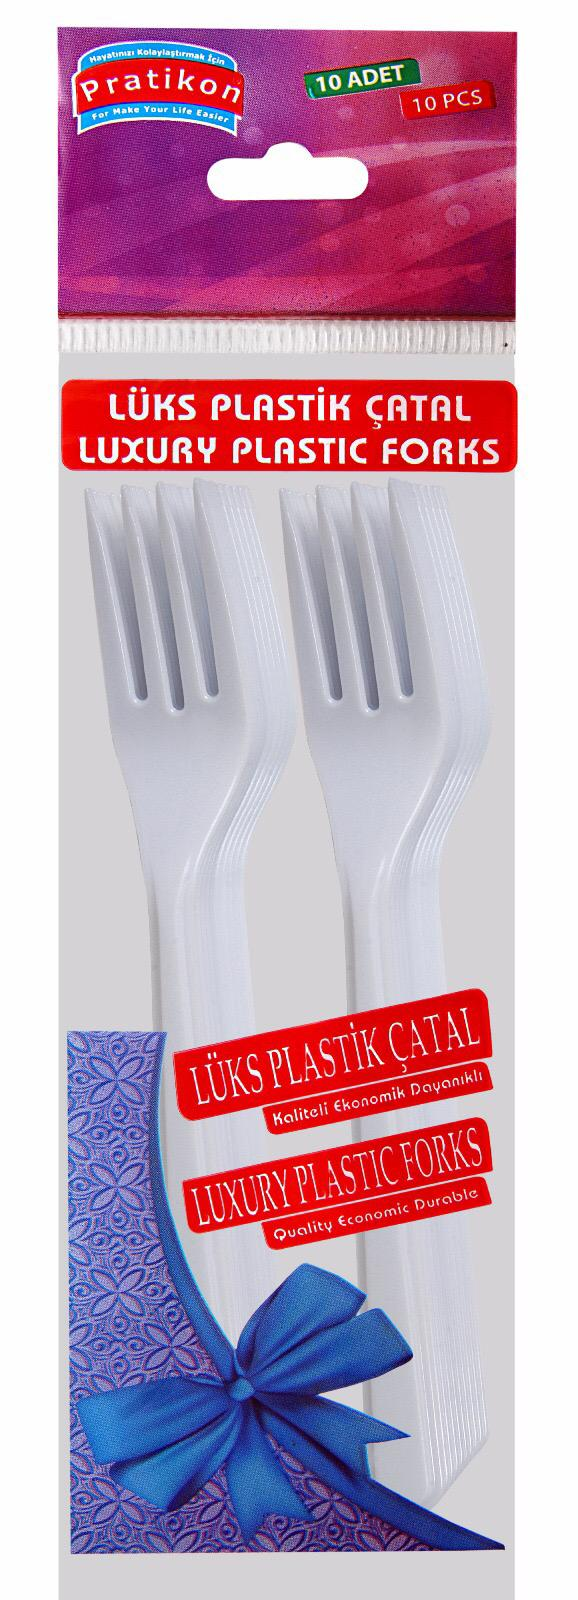 lux plastic forks